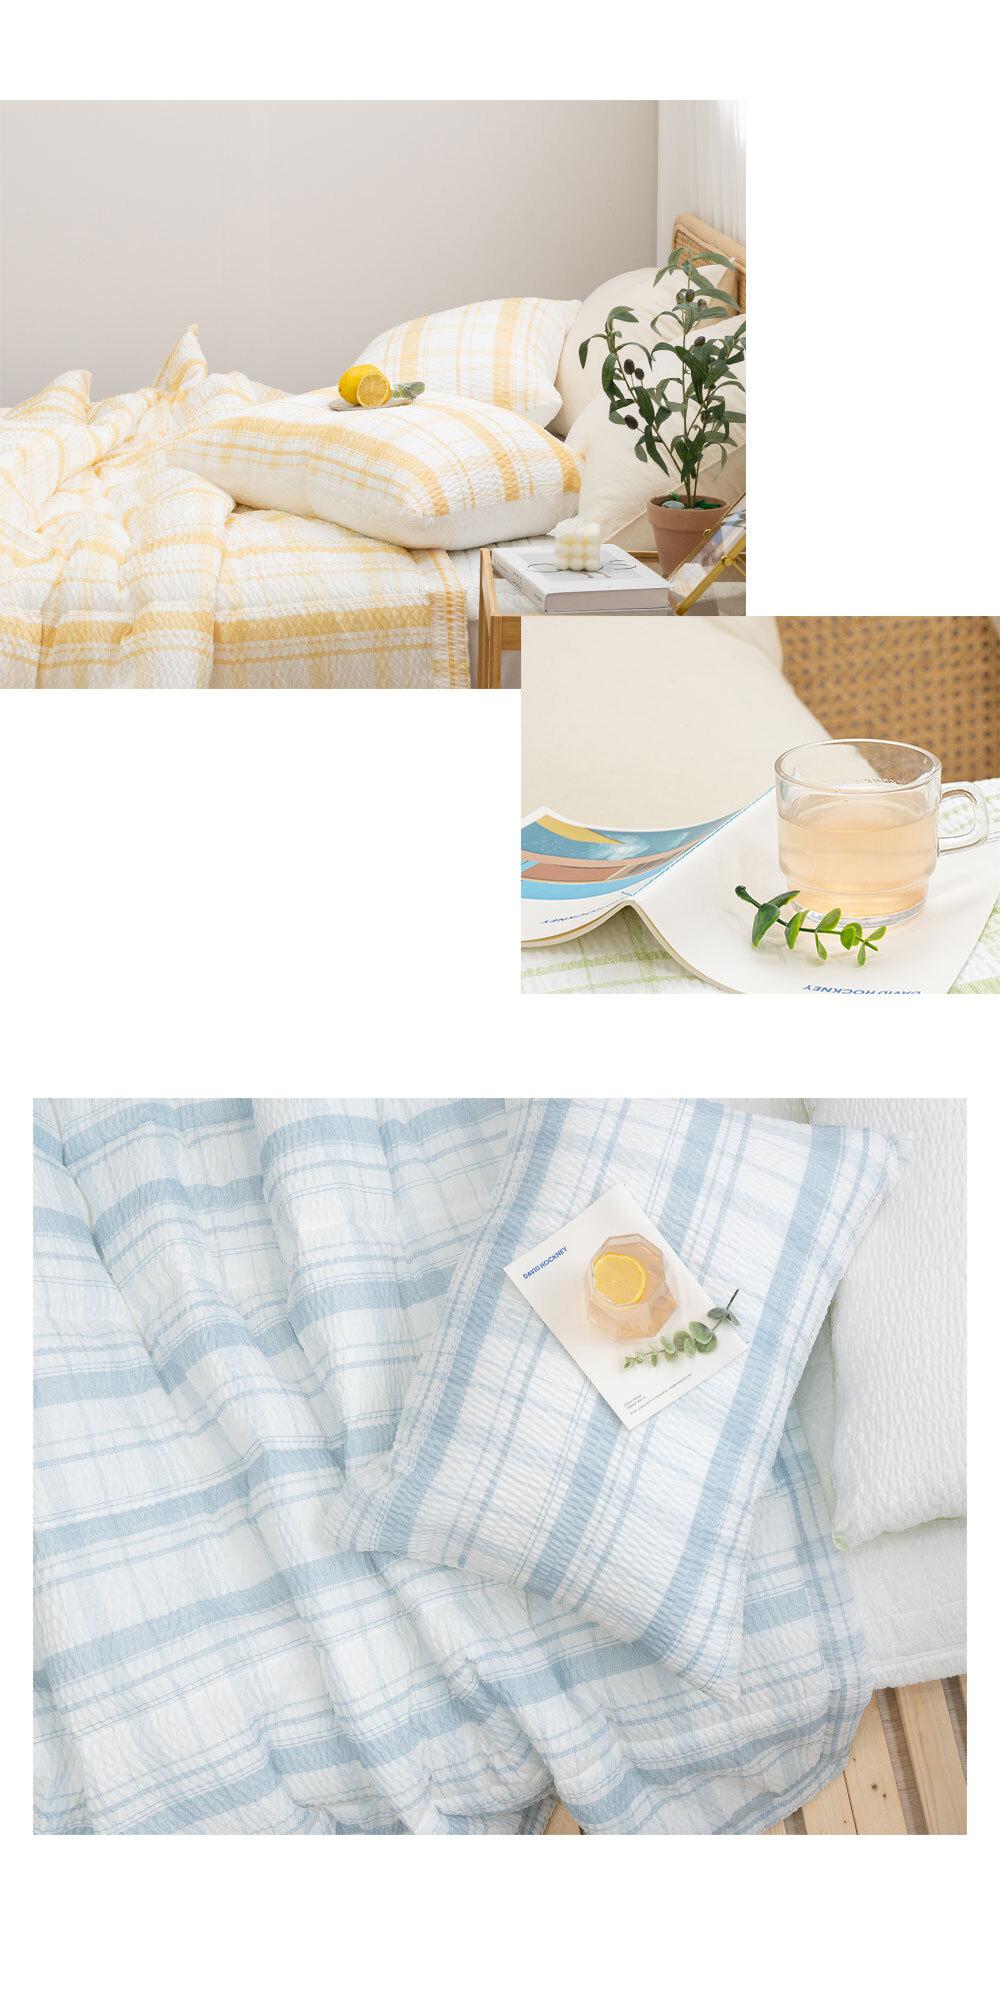 butterring_bed_03.jpg